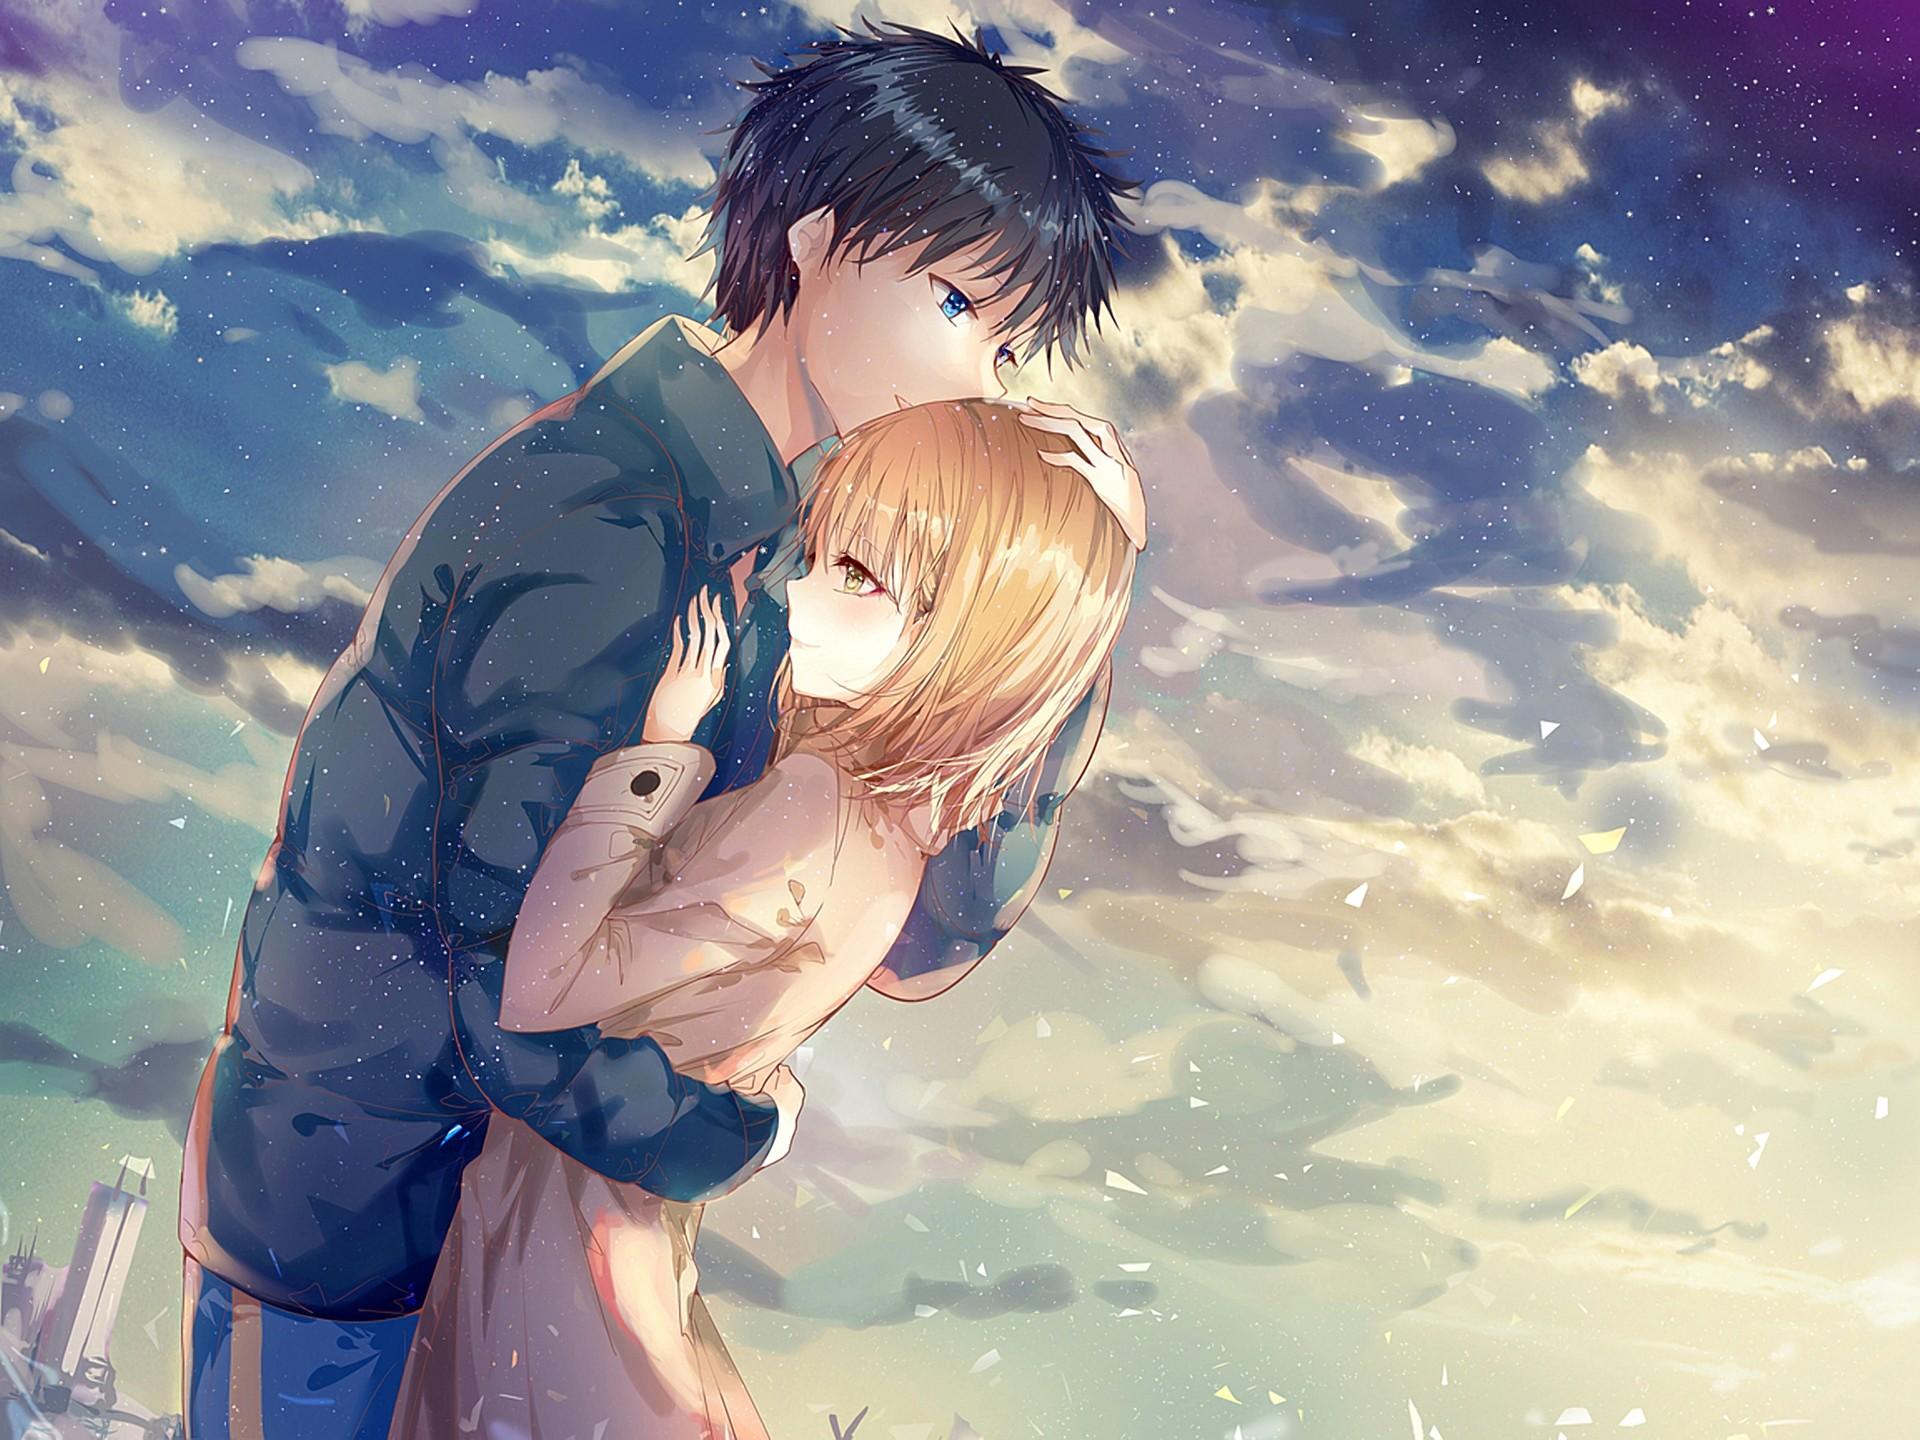 Top 10 Cute Romance Anime List Best Recommendations